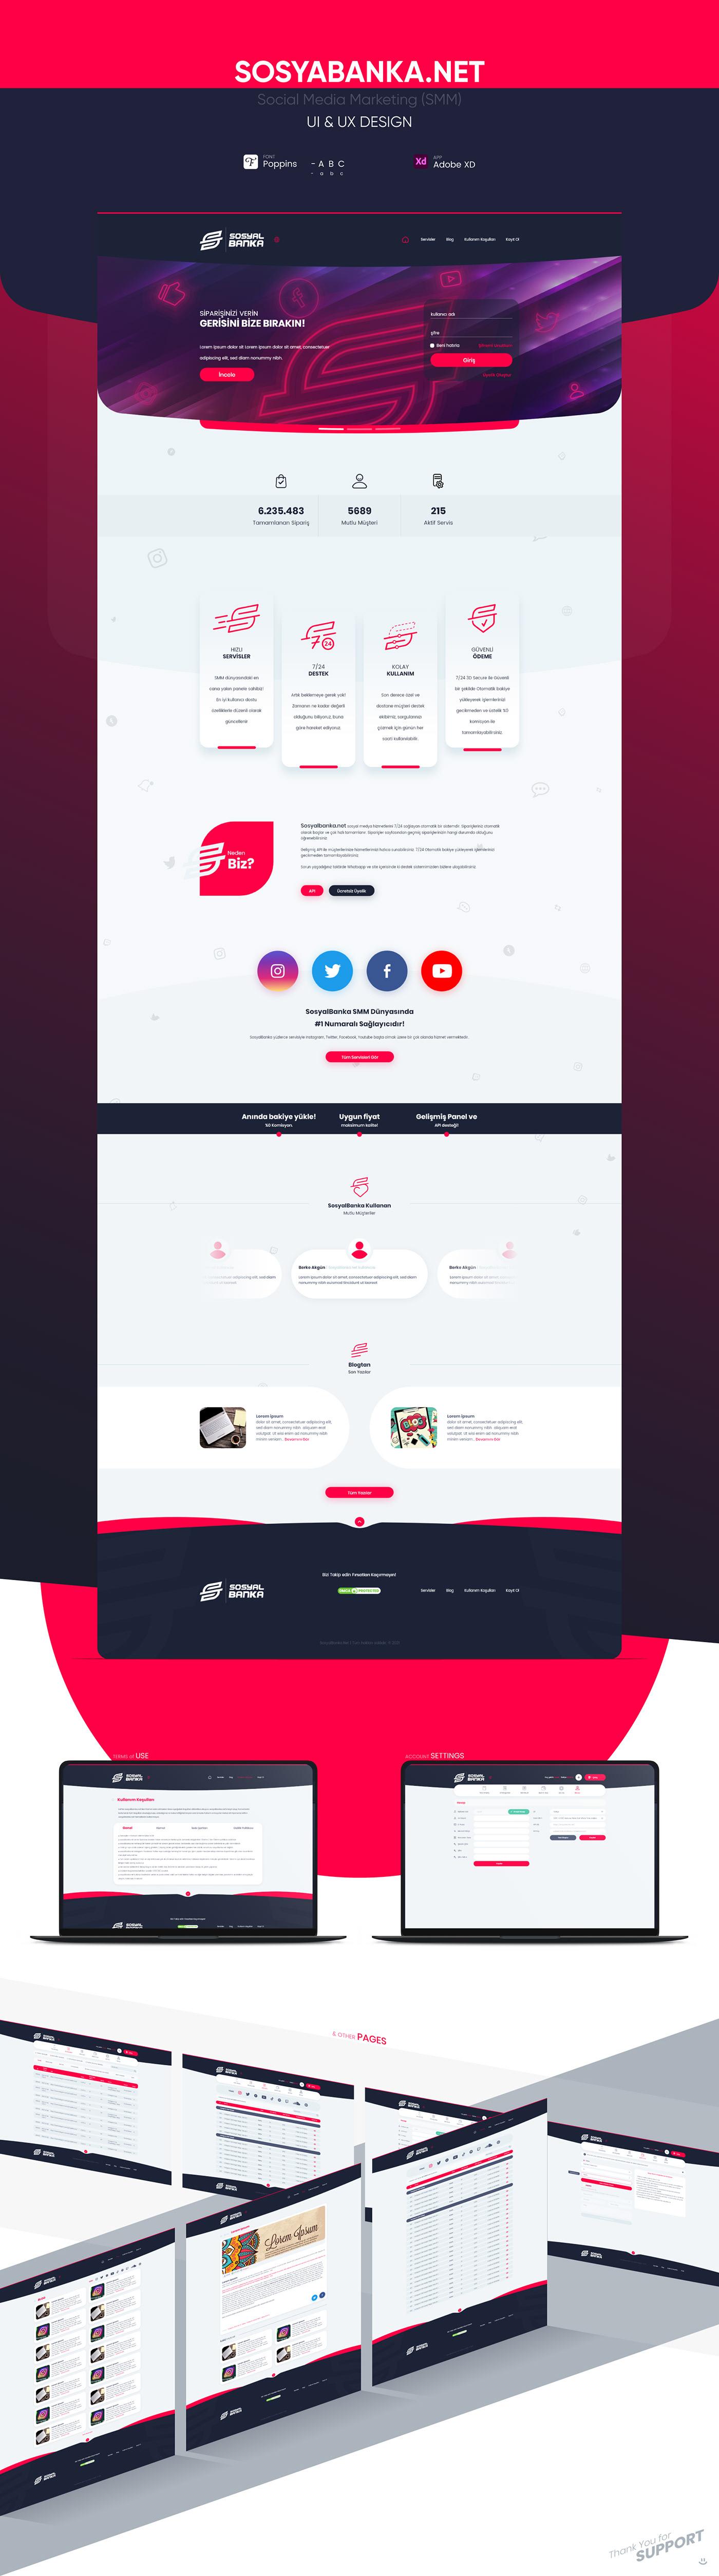 Like Mobile UI services SMM social media social media marketing Web UI